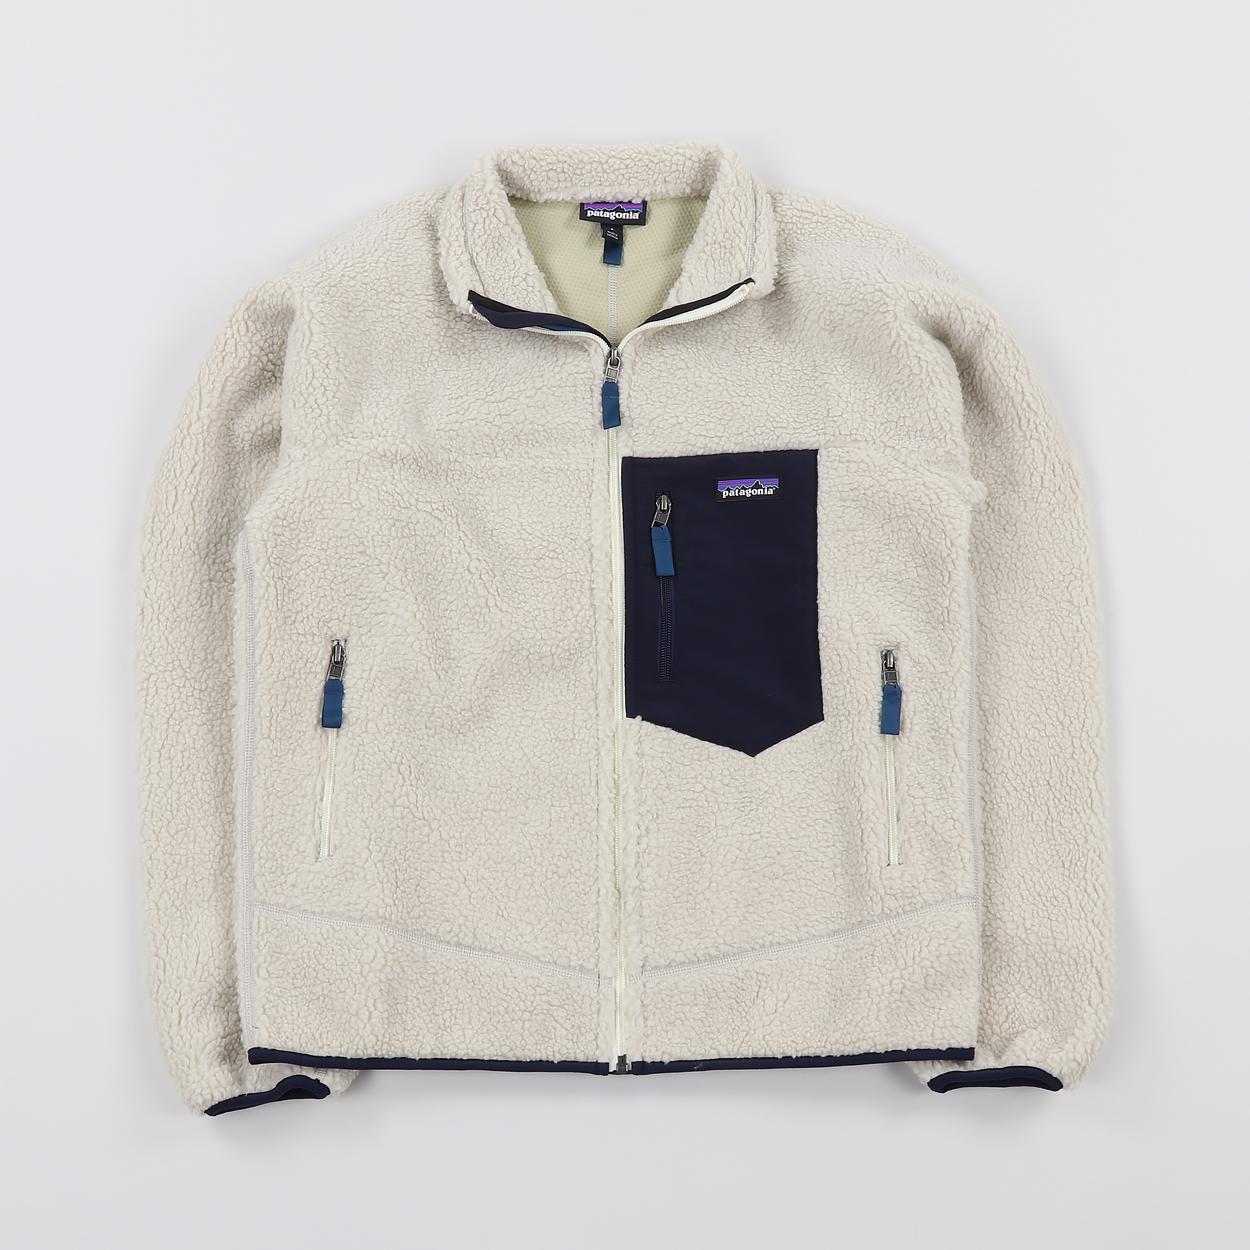 Patagonia Classic Retro-X Jacket Natural